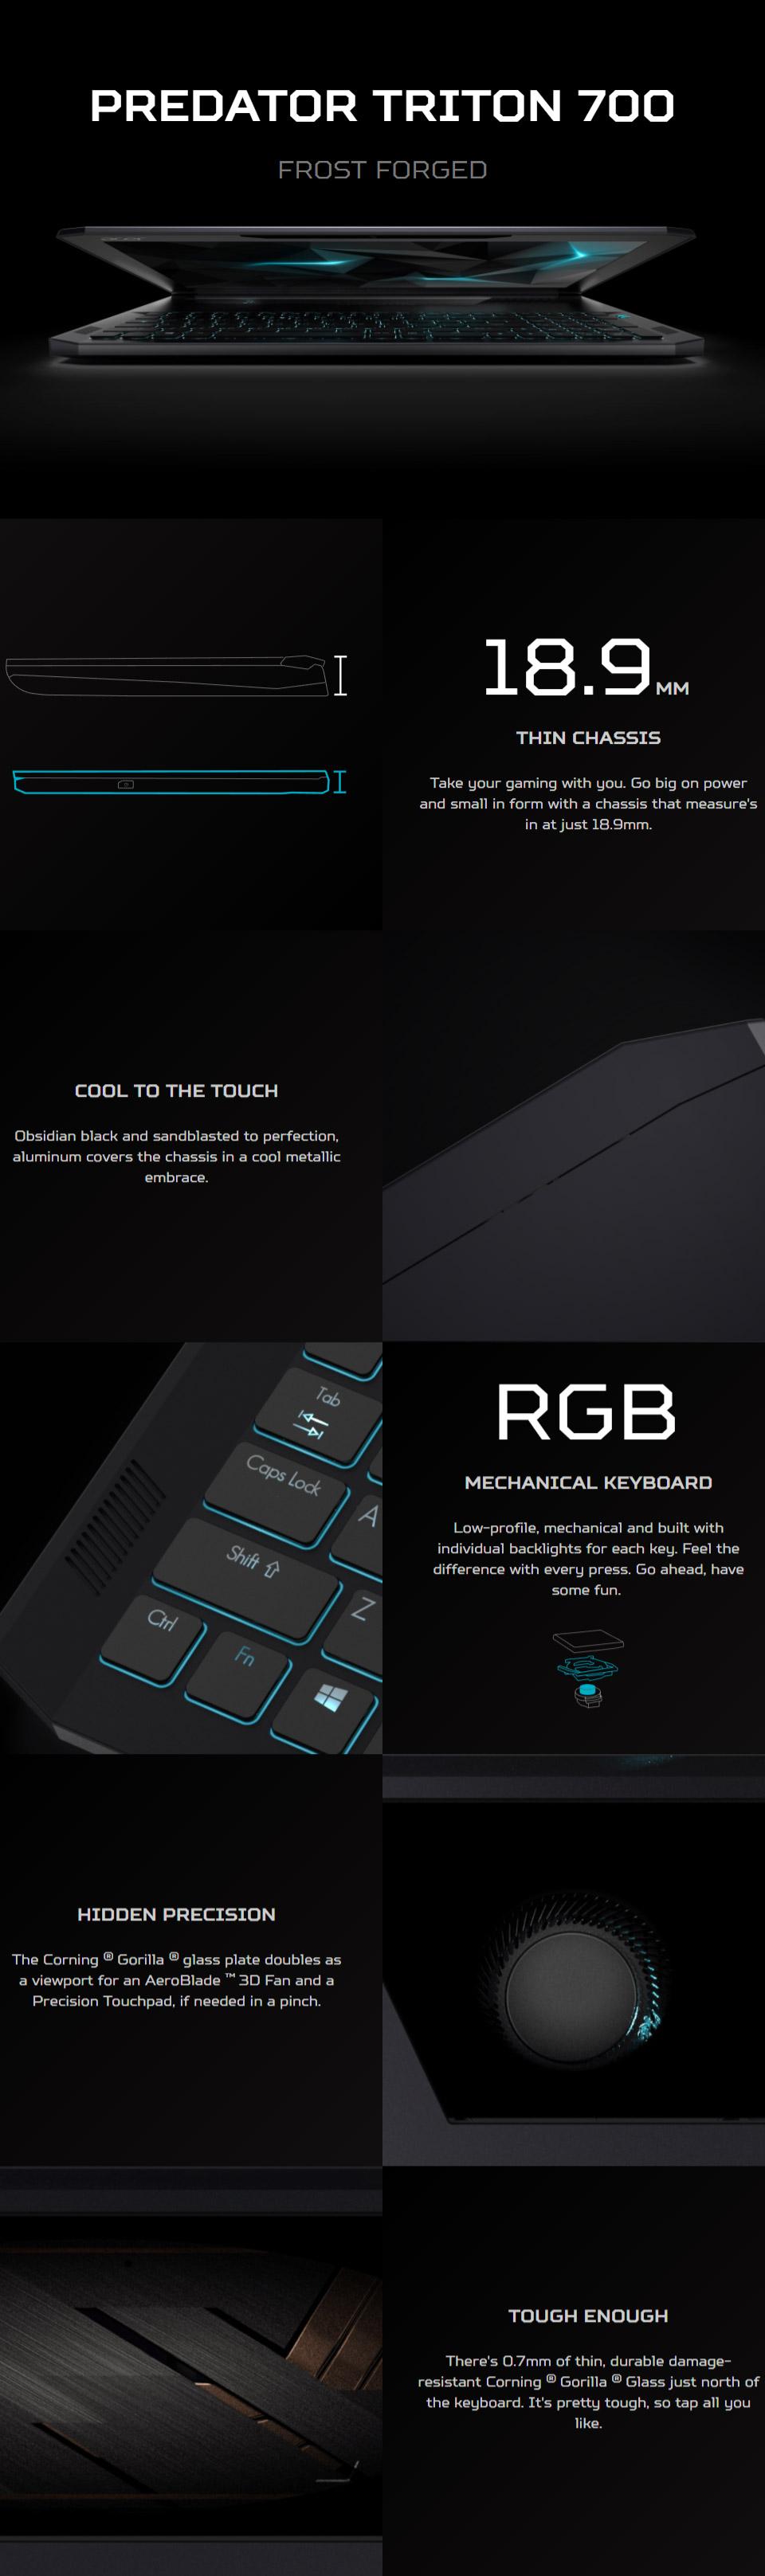 Acer Predator Triton 700 156in Gaming Notebook Pt715 51 70q2